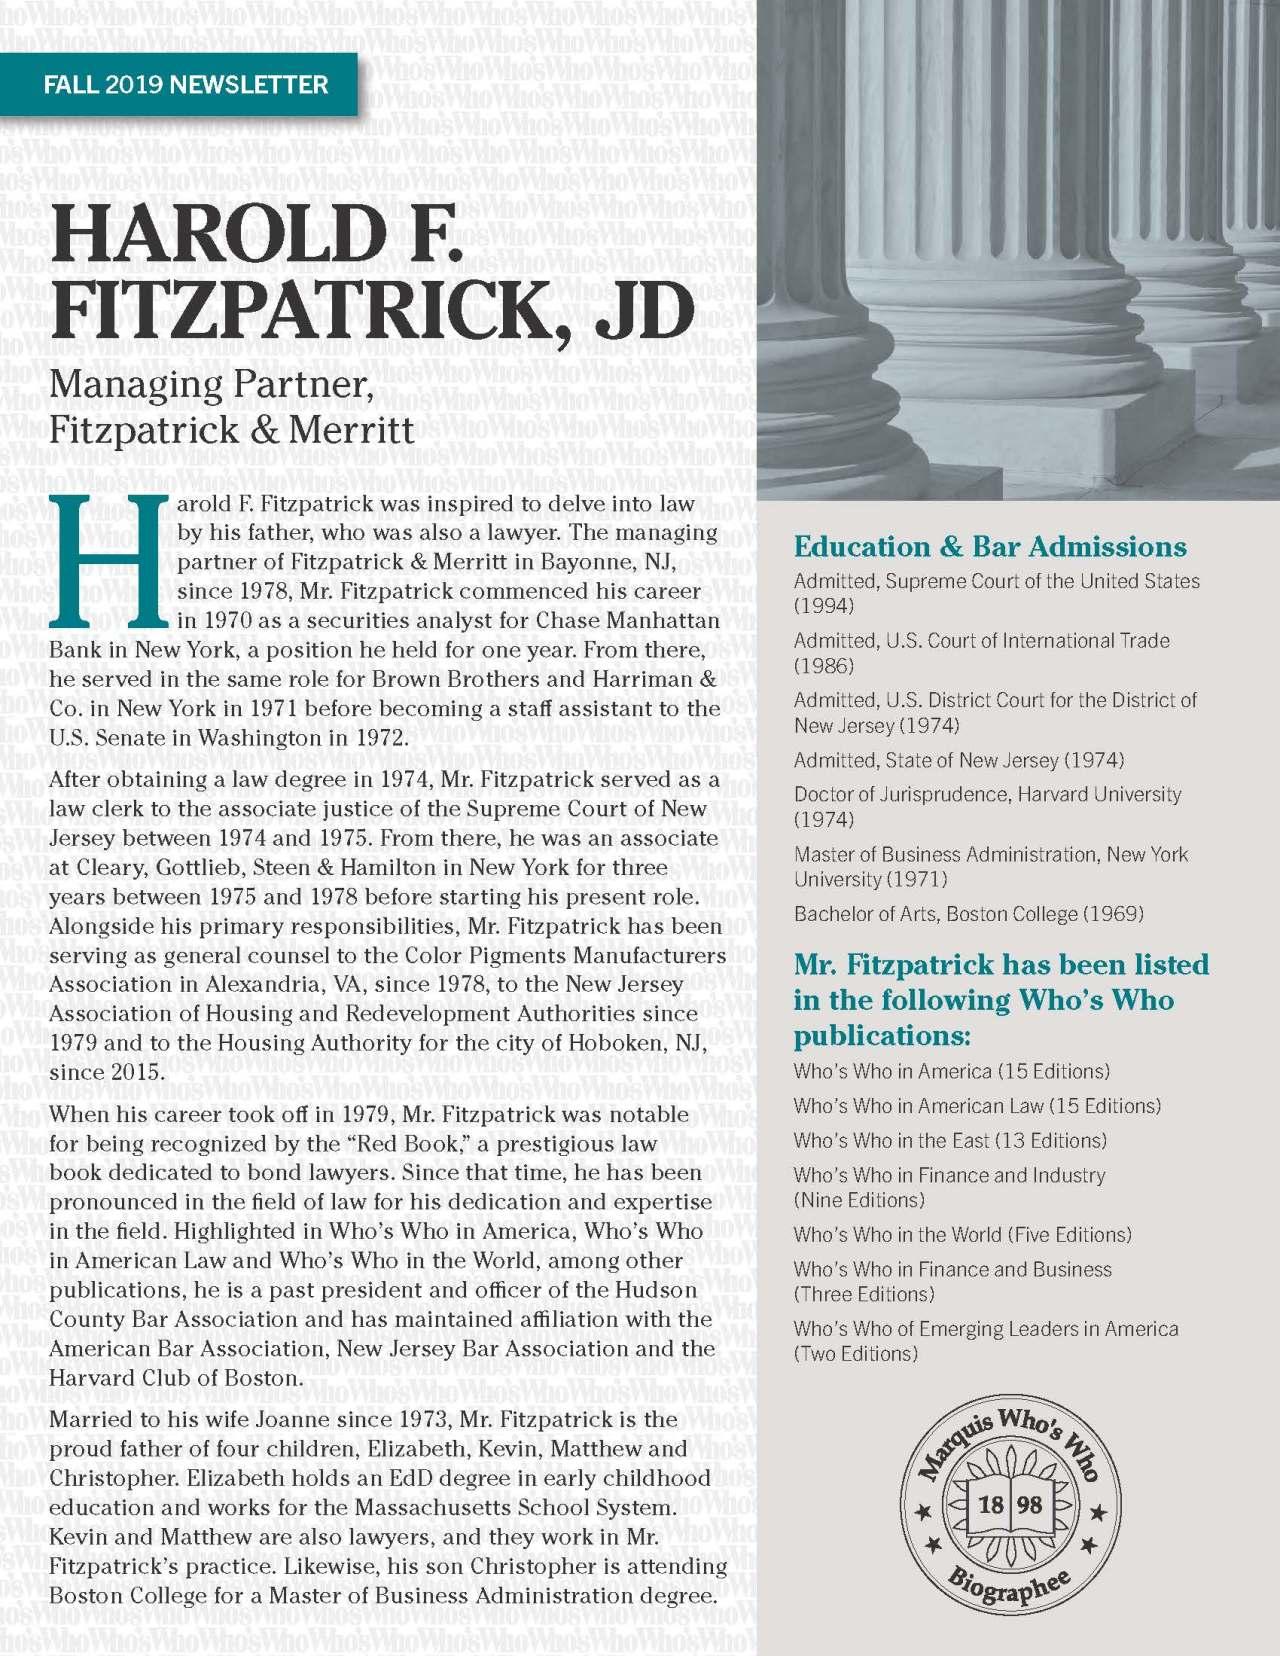 Fitzpatrick, Harold 4228598_412571 Newsletter REVISED